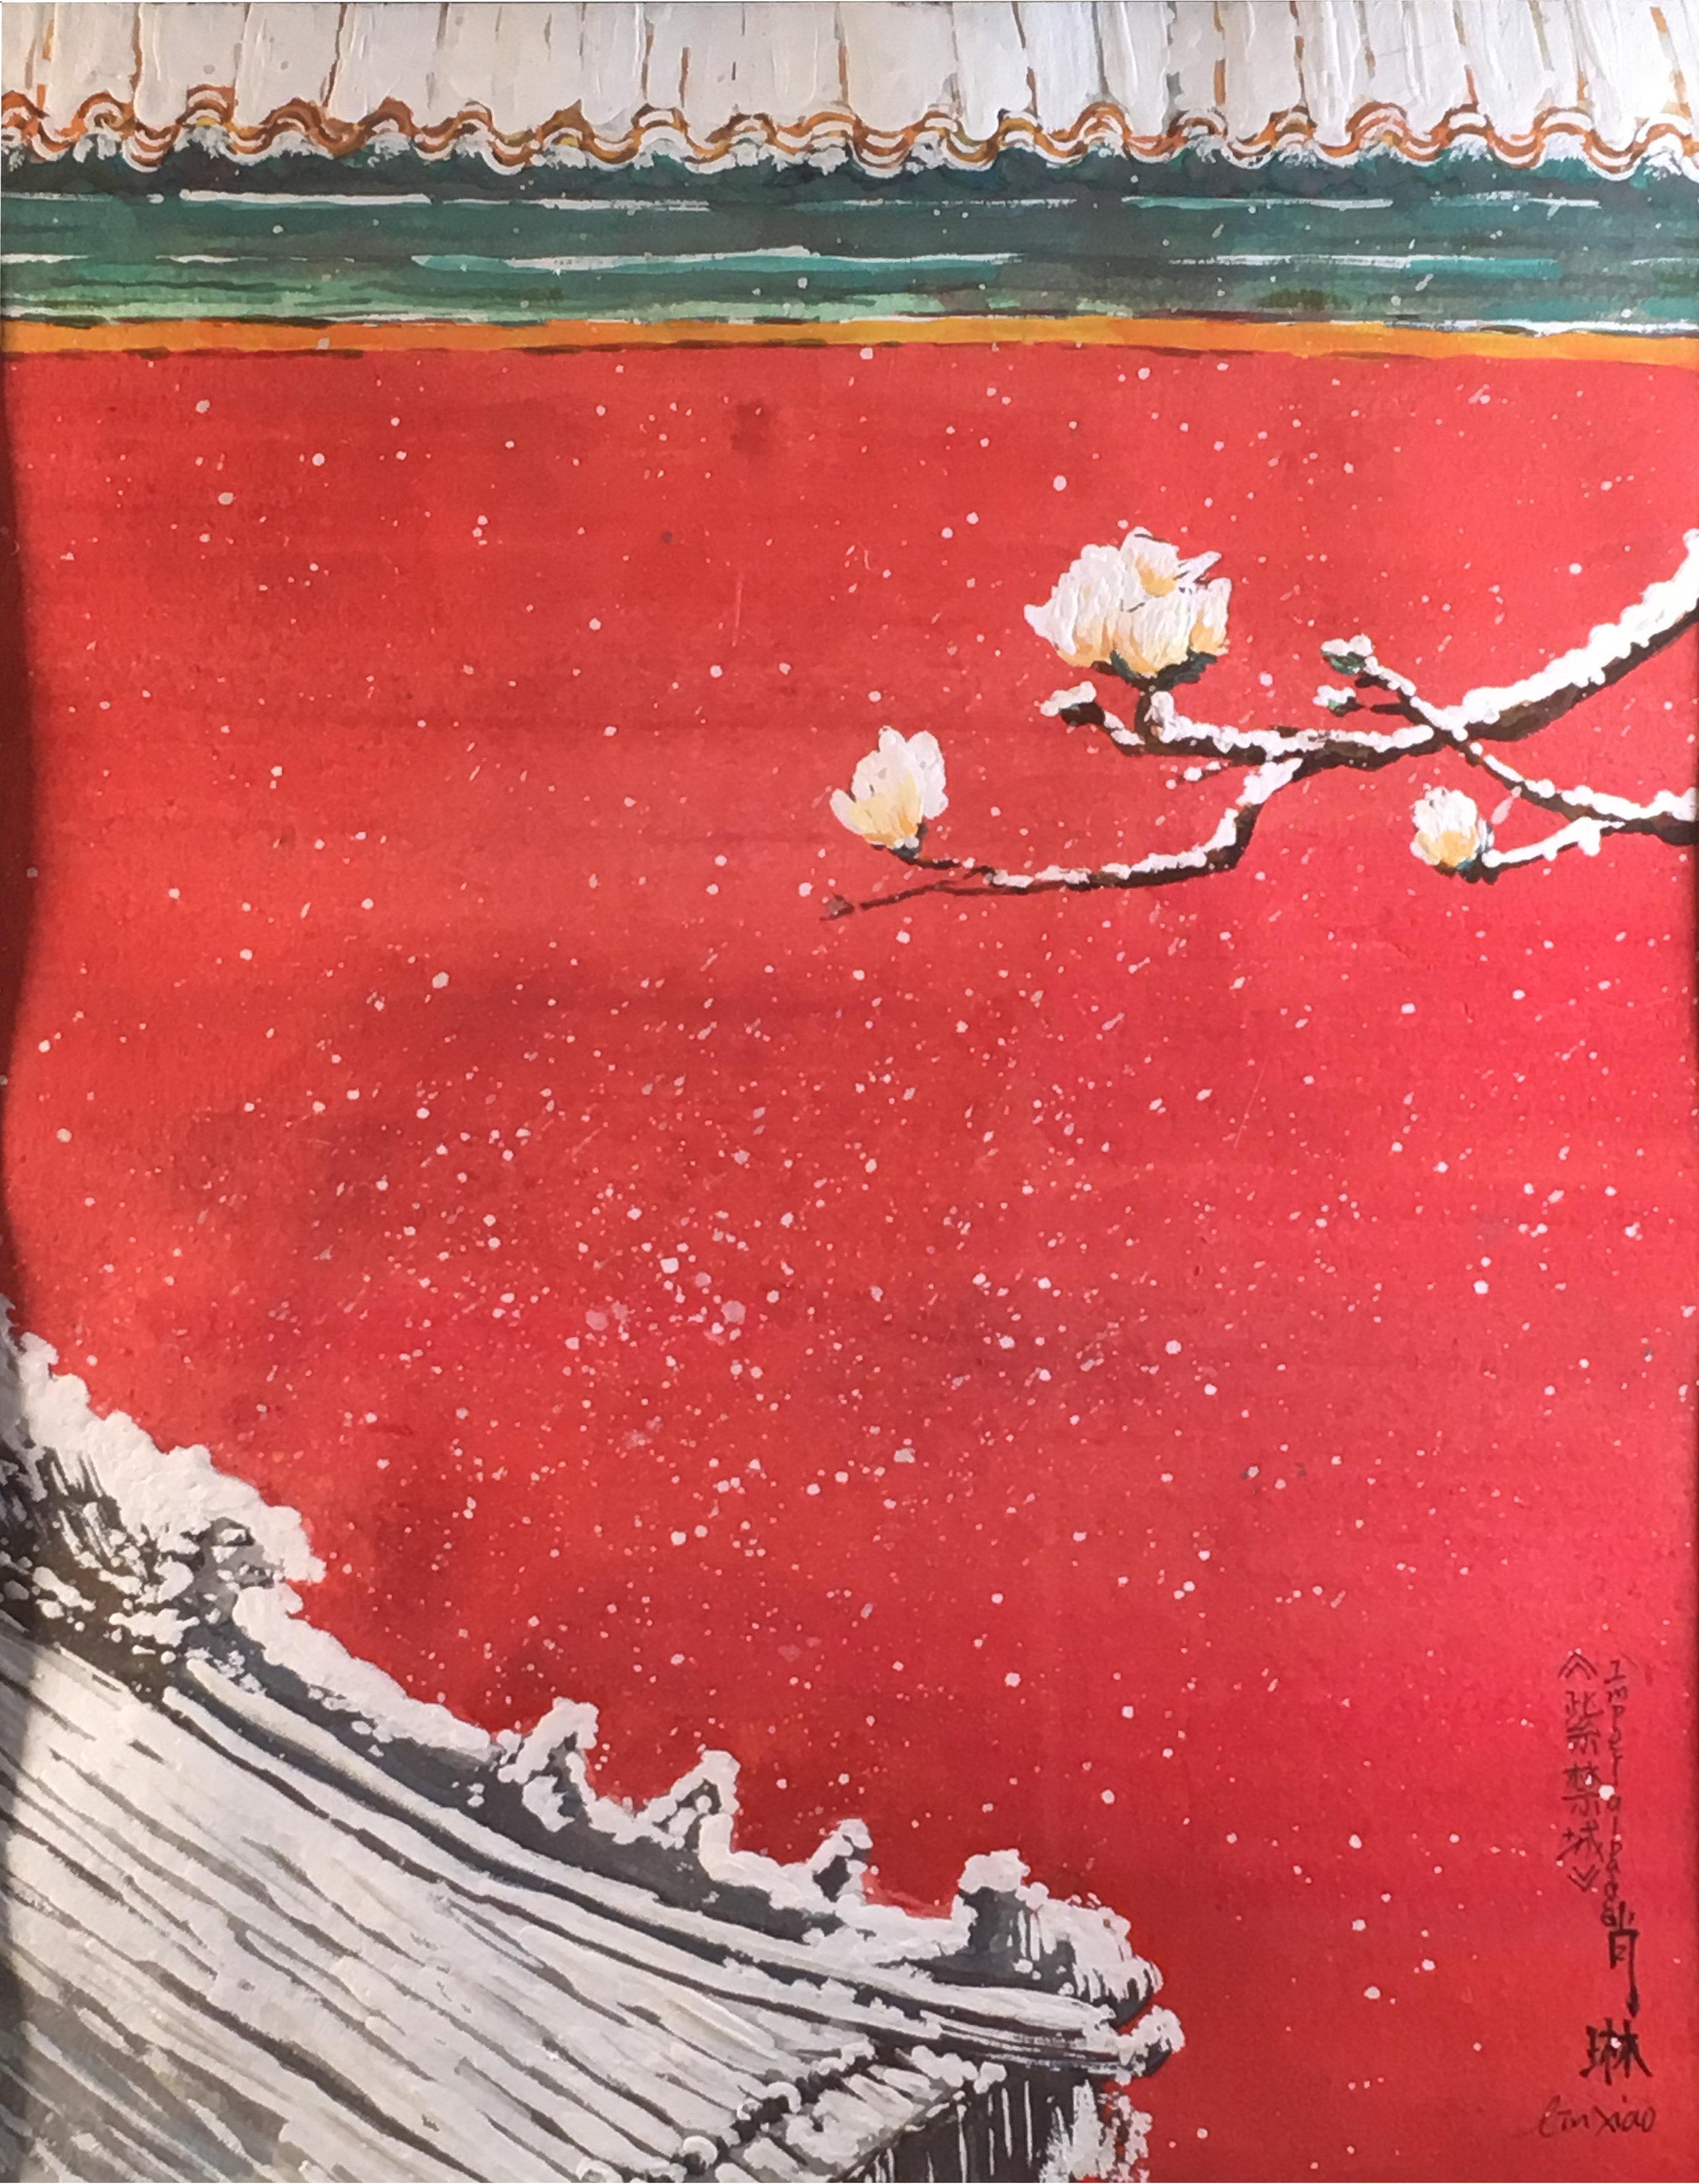 Lin Xiao  500 Years Ago Watercolor, pen  Atlantic Christian School 18x12  Atlantic County